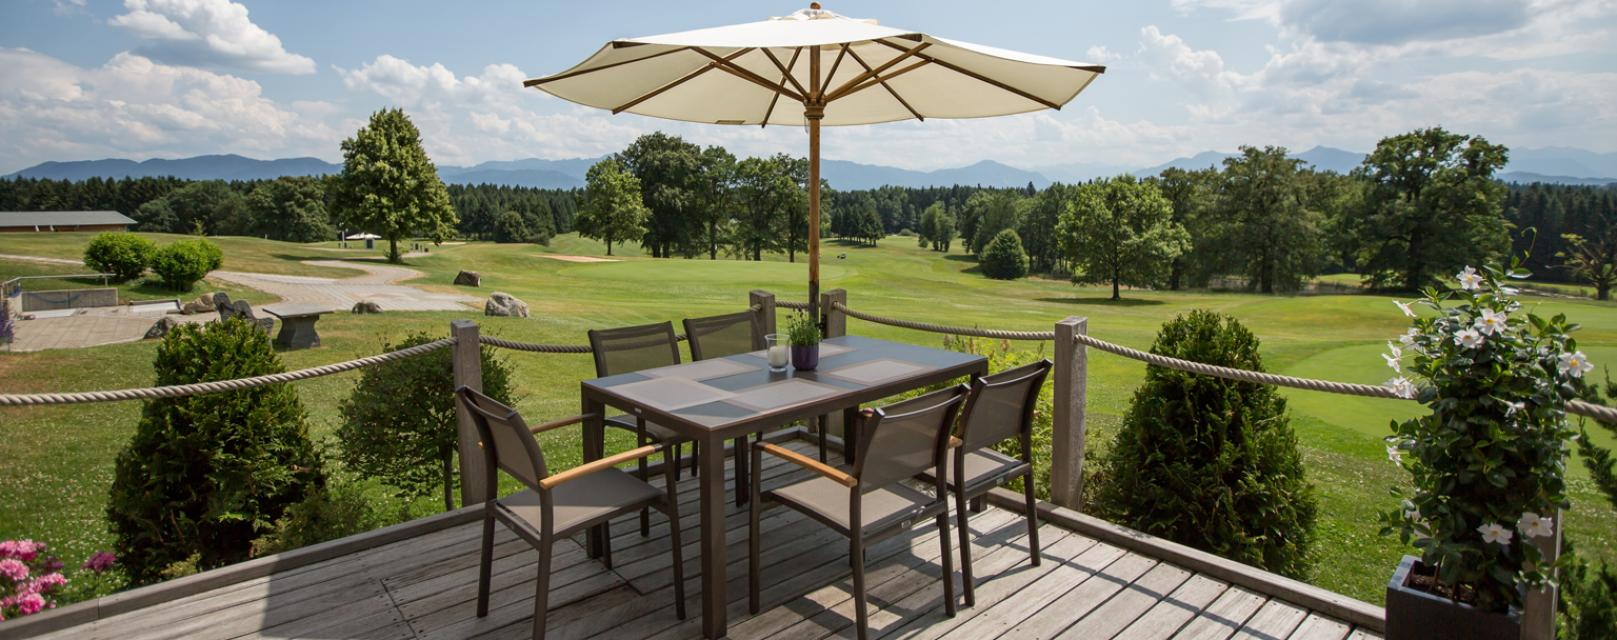 Pio Mars - St. Eurach Land-& Golfclub e.V.